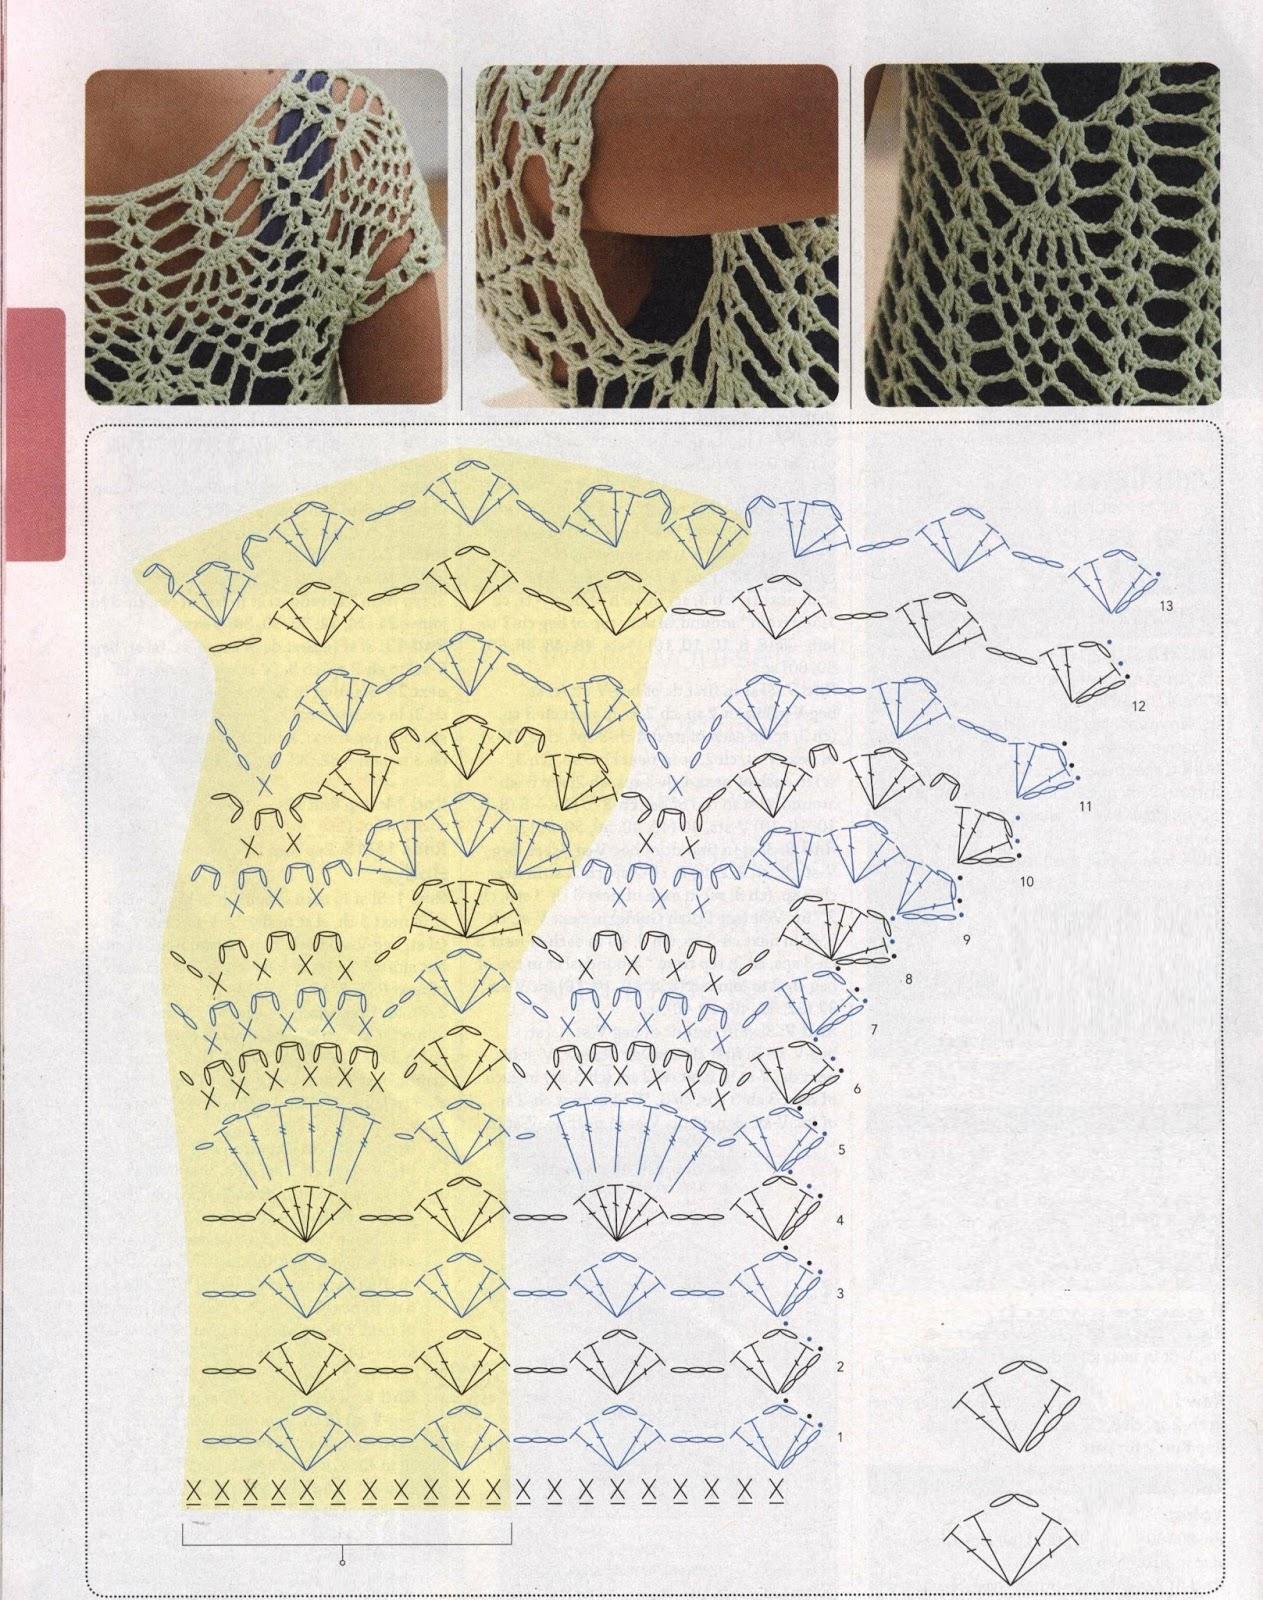 Crochet Jersey Stitch : stitch crochet crochet knitting 7 crochet dos crochet dress crochet ...